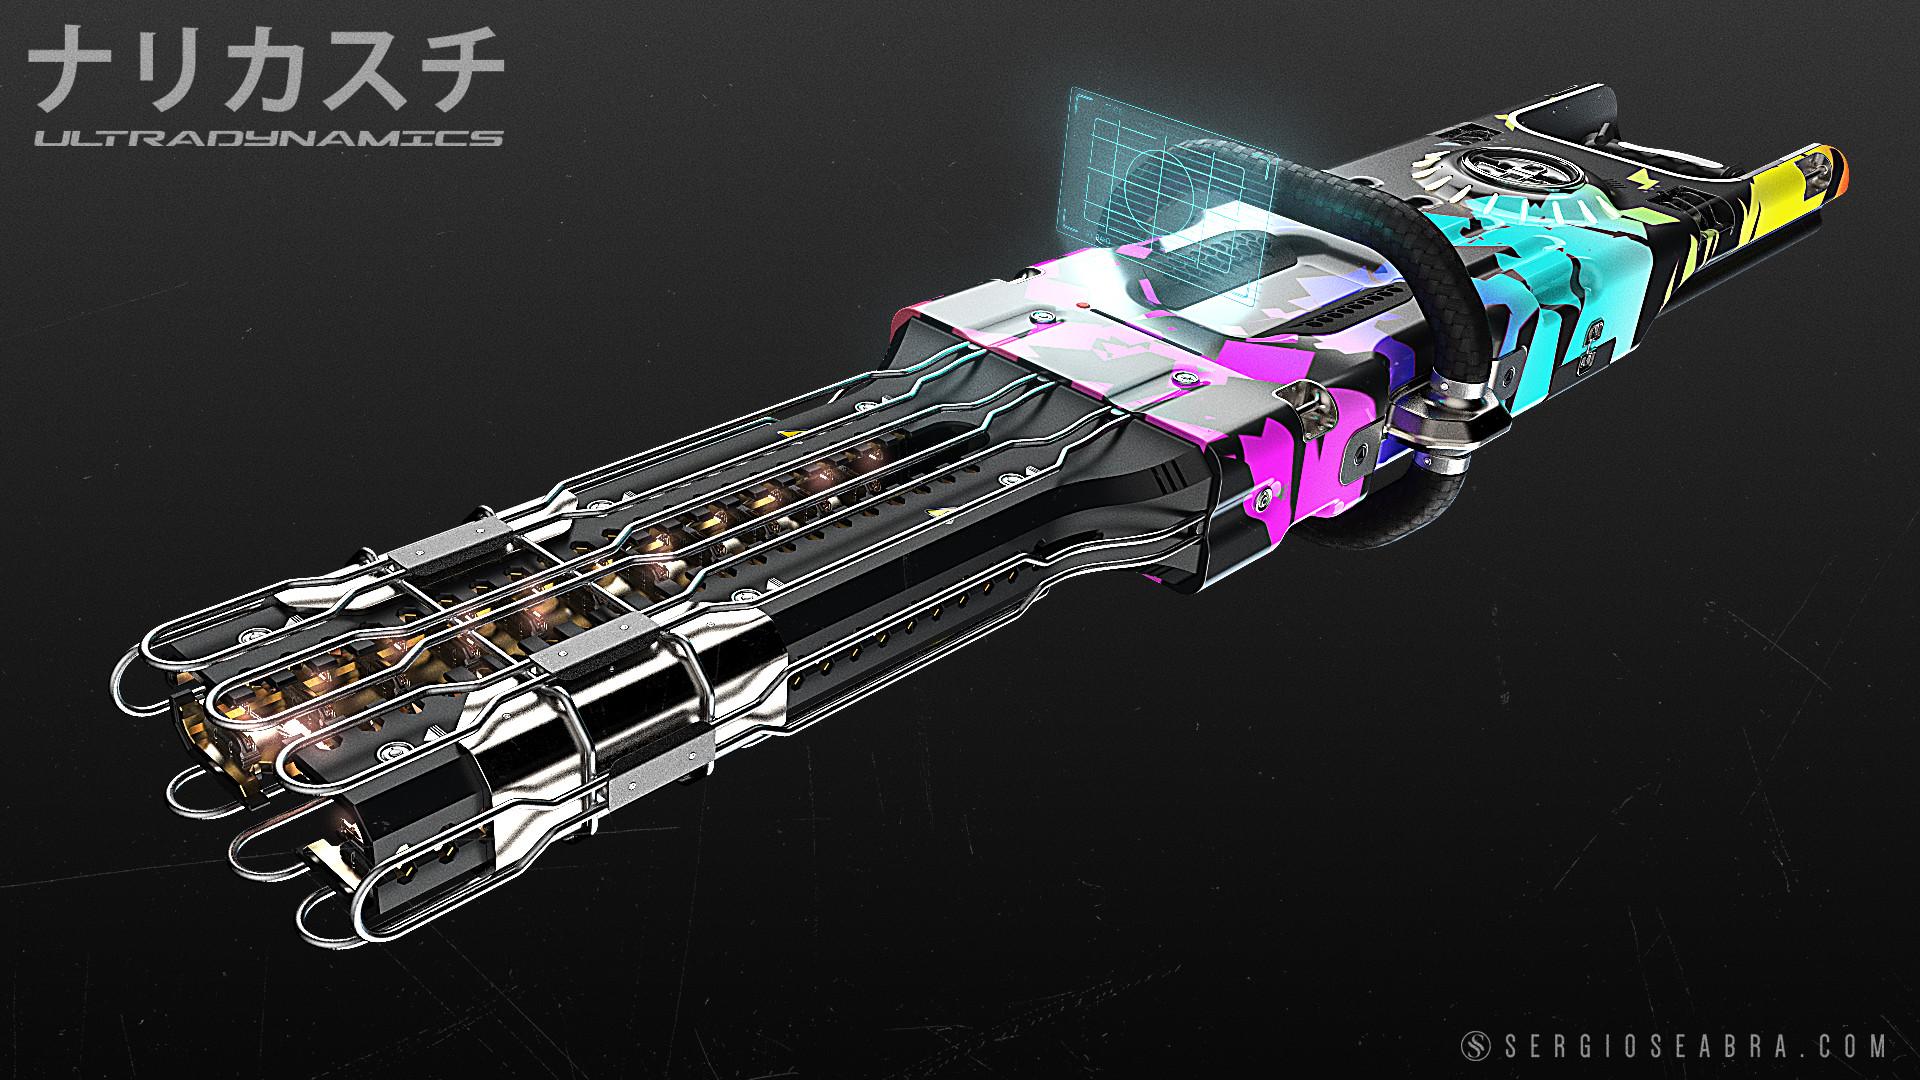 Sergio seabra layout012 plasma cannon